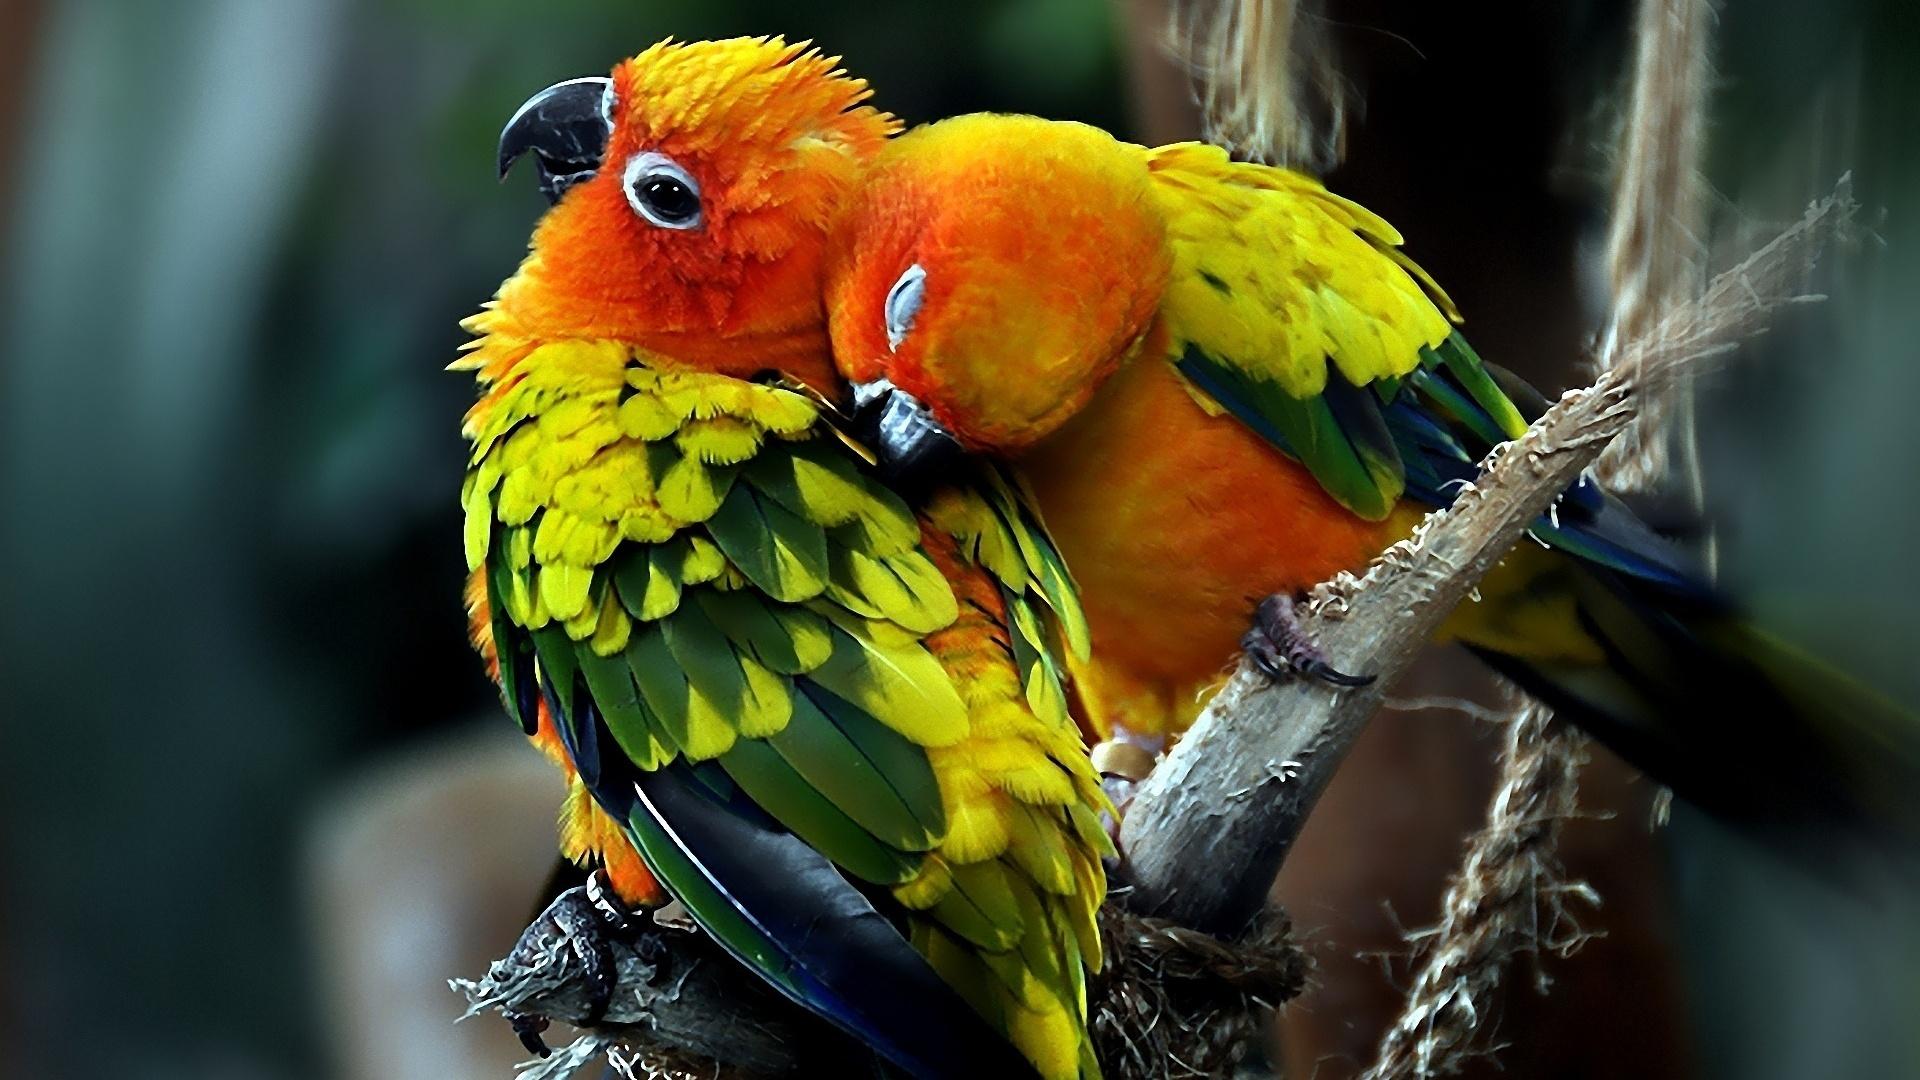 Download Birds Beautiful Colorful Bird Wallng Wallpaper 1920x1080 1920x1080